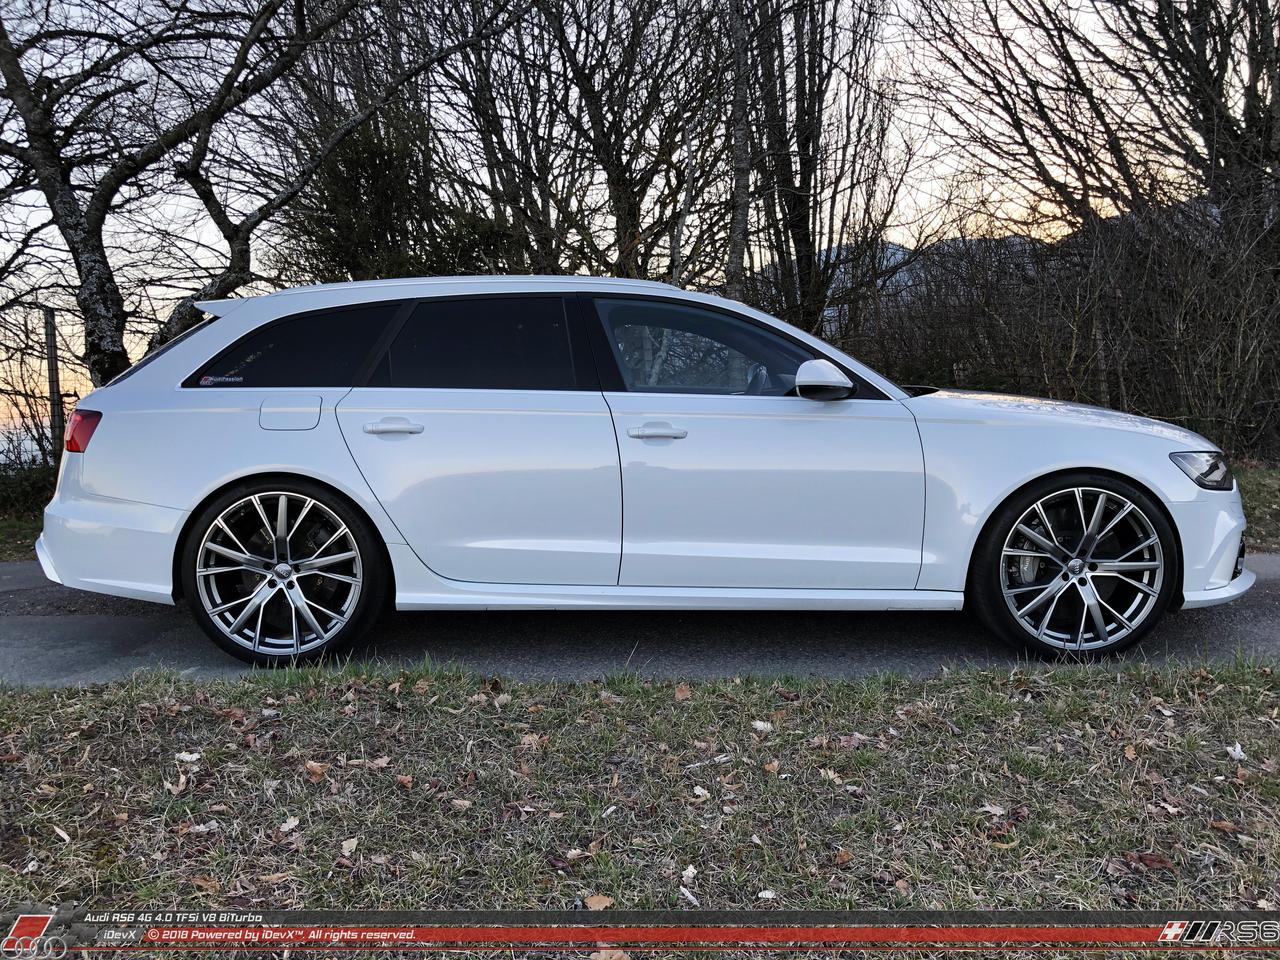 22_02.2019_Audi-RS6_iDevX_005.png